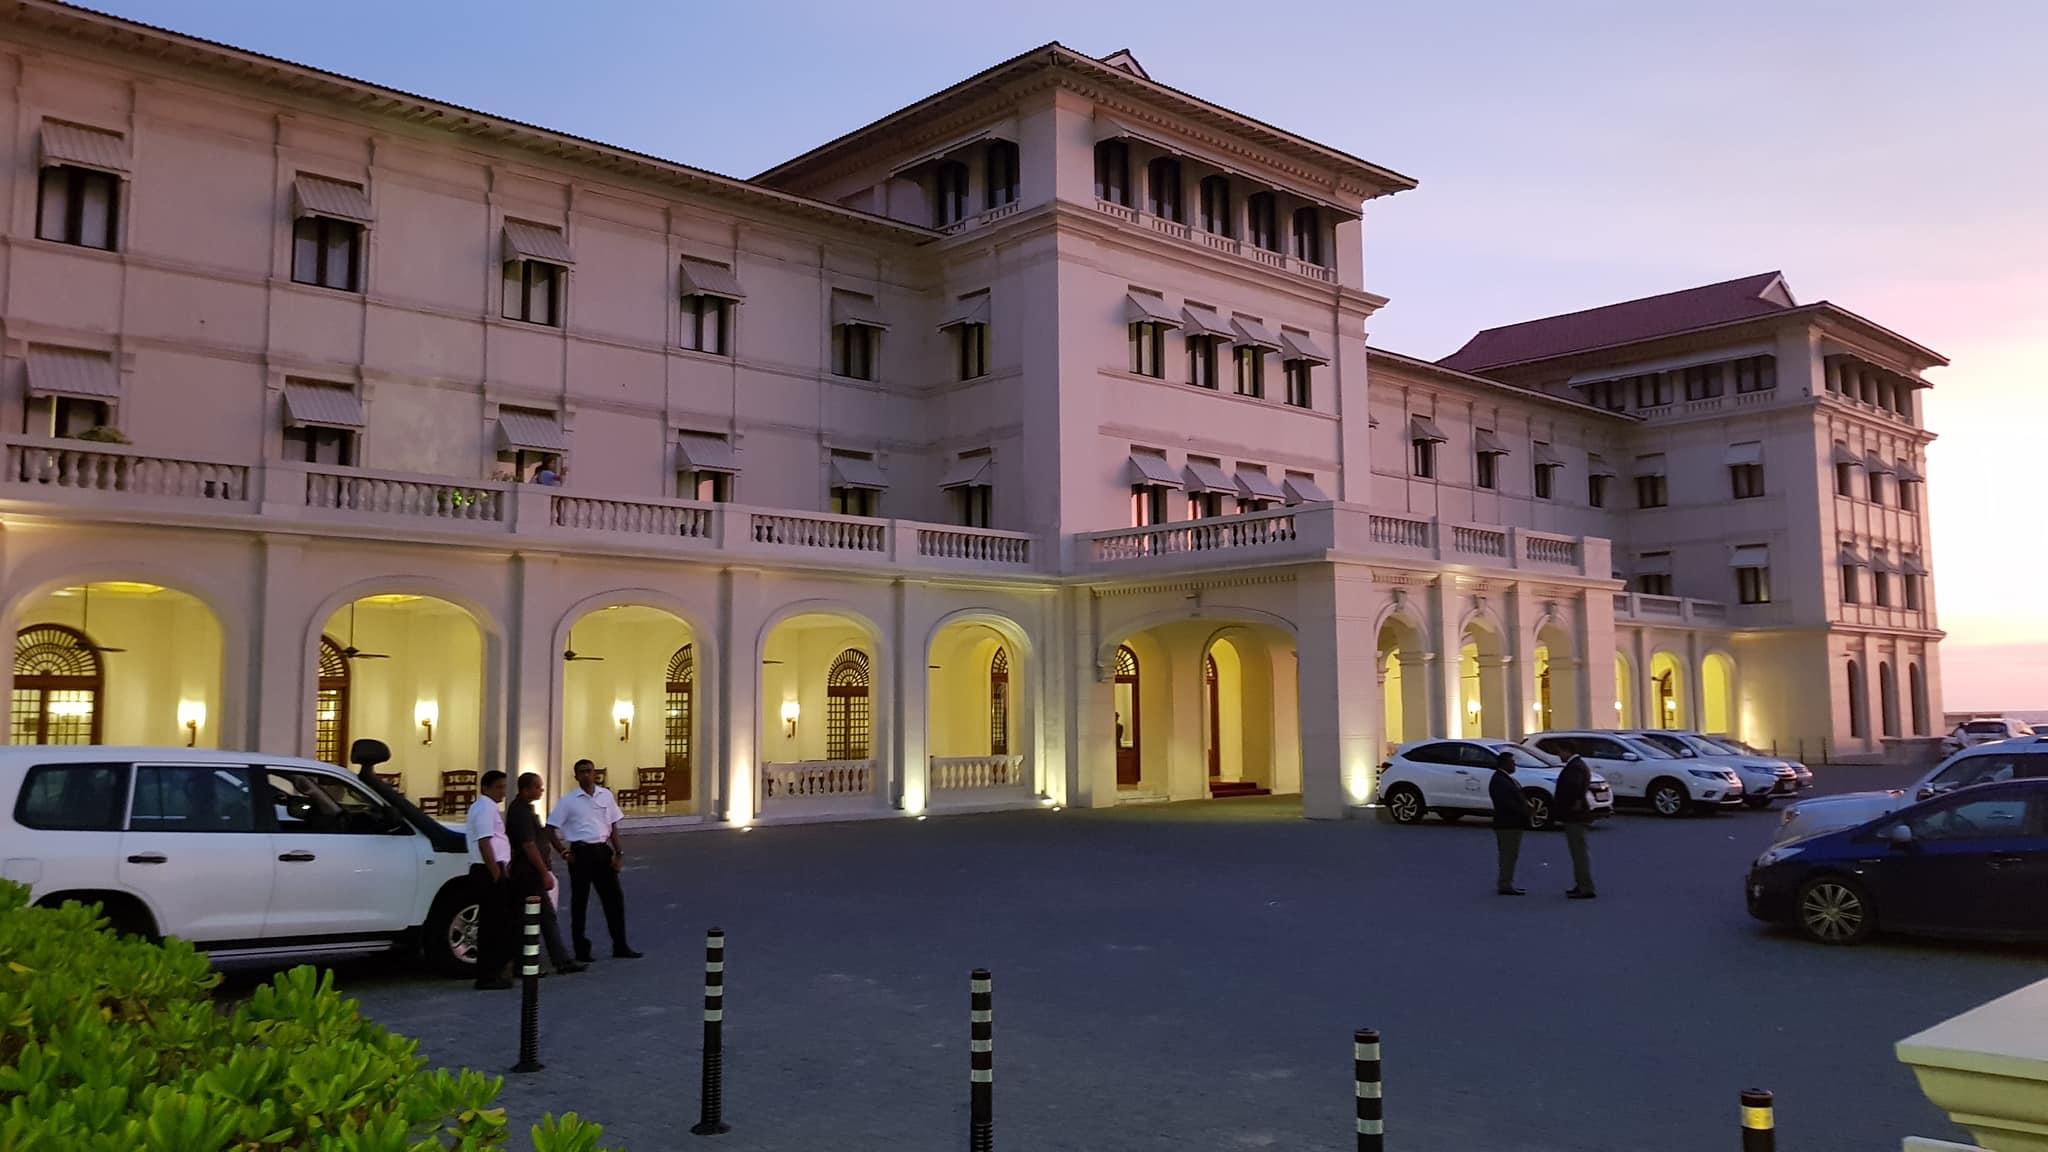 invite-to-paradise-sri-lanka-maldives-holiday-honeymoon-specialists-customer-guest-feedback-zane-lisa-butcher-colombo-galle-face-hotel-.jpg